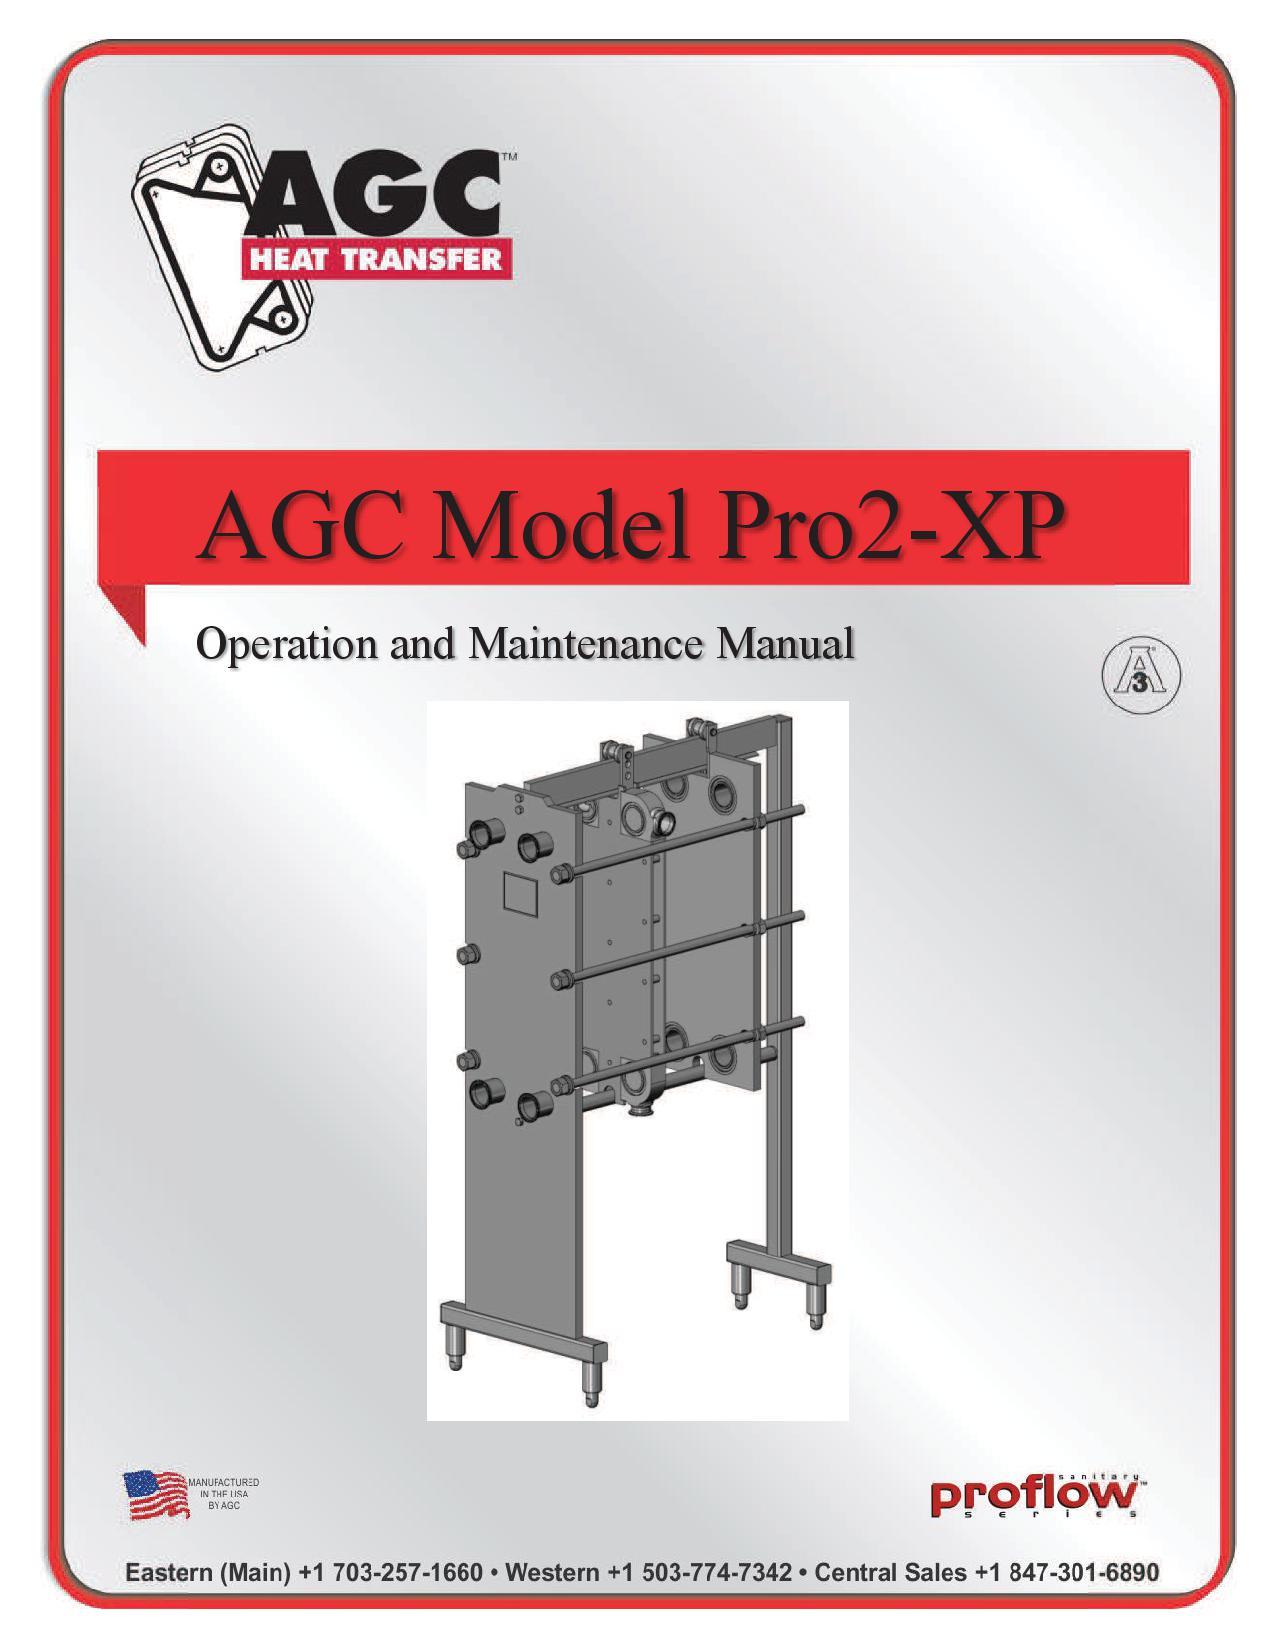 AGC Operating Manual Pro2-XP